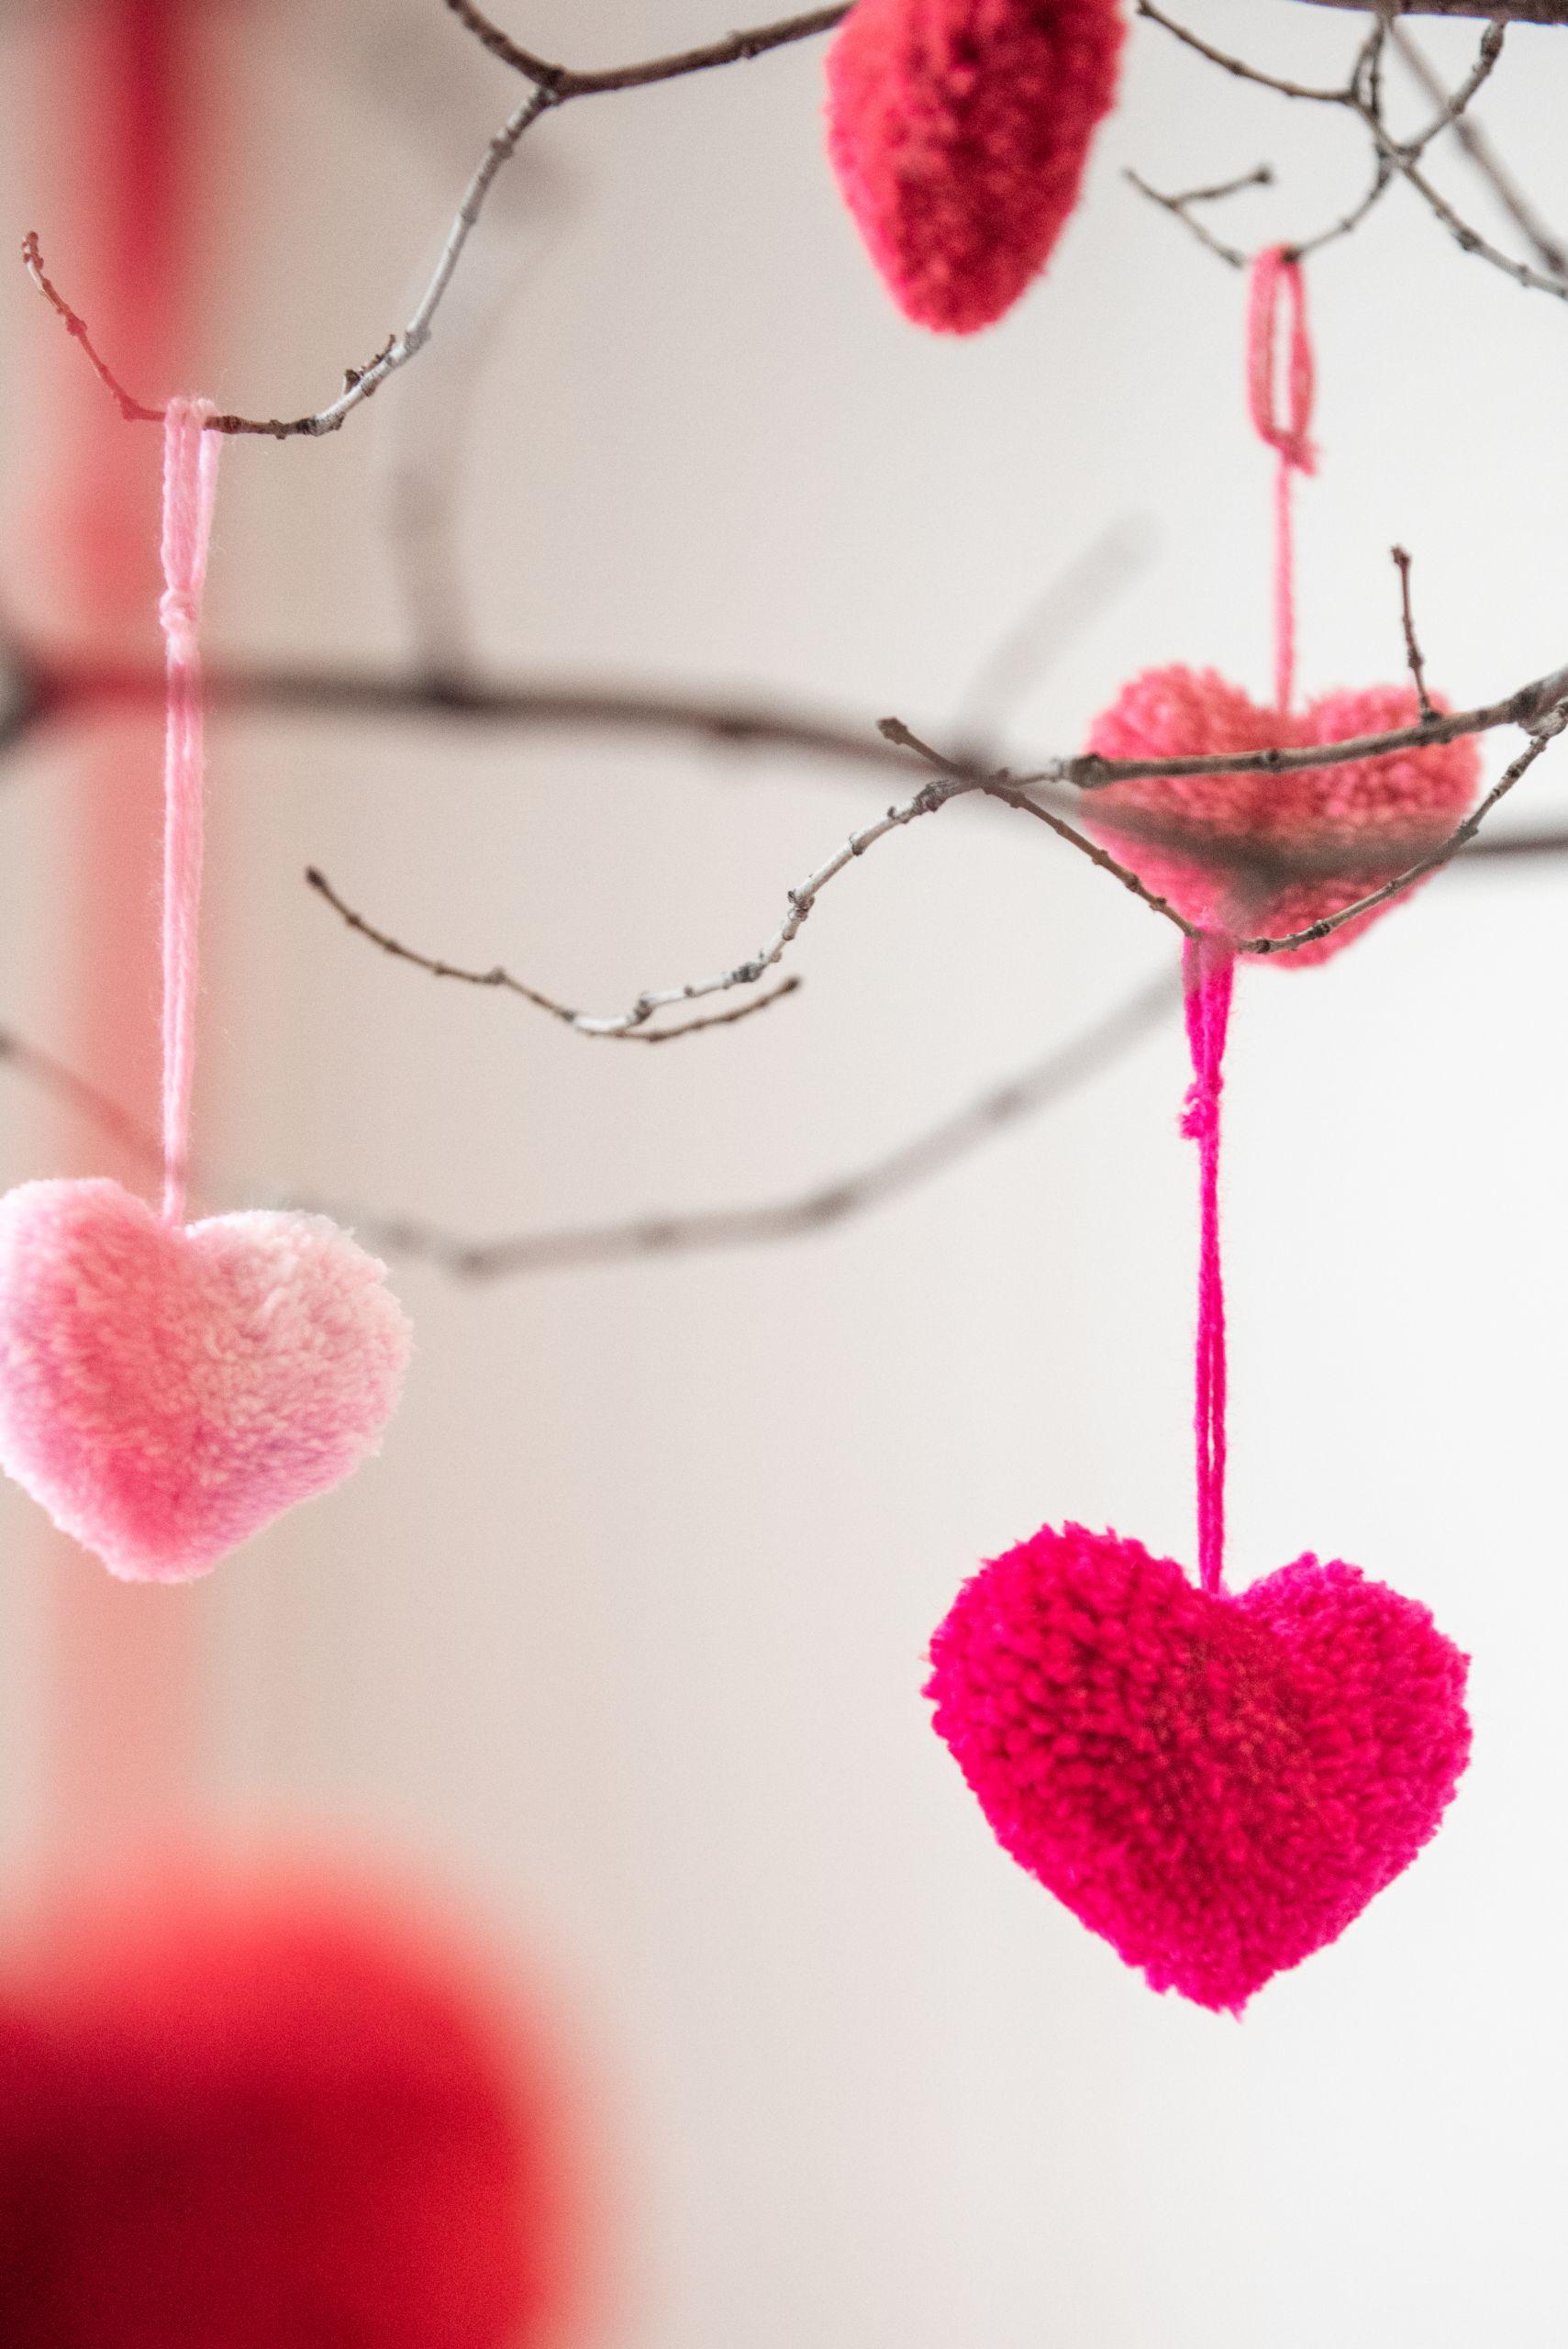 35 Best Romantic Bedroom Ideas Romantic Decorating Ideas For Couples